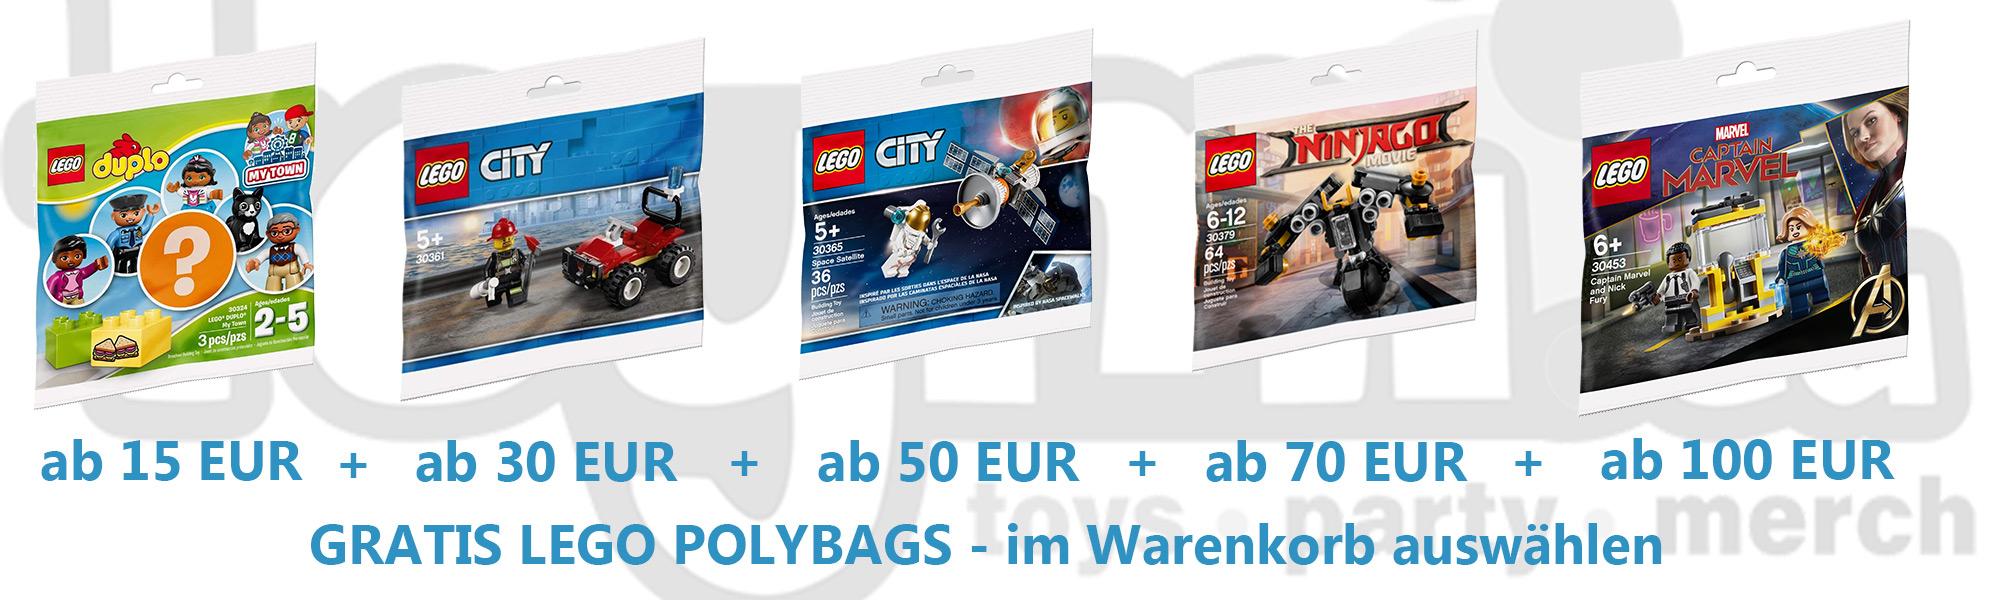 [Toymi.eu] Gratis Lego Polybag ab 15€ Staffelung bis 5 Polybags bei 100€